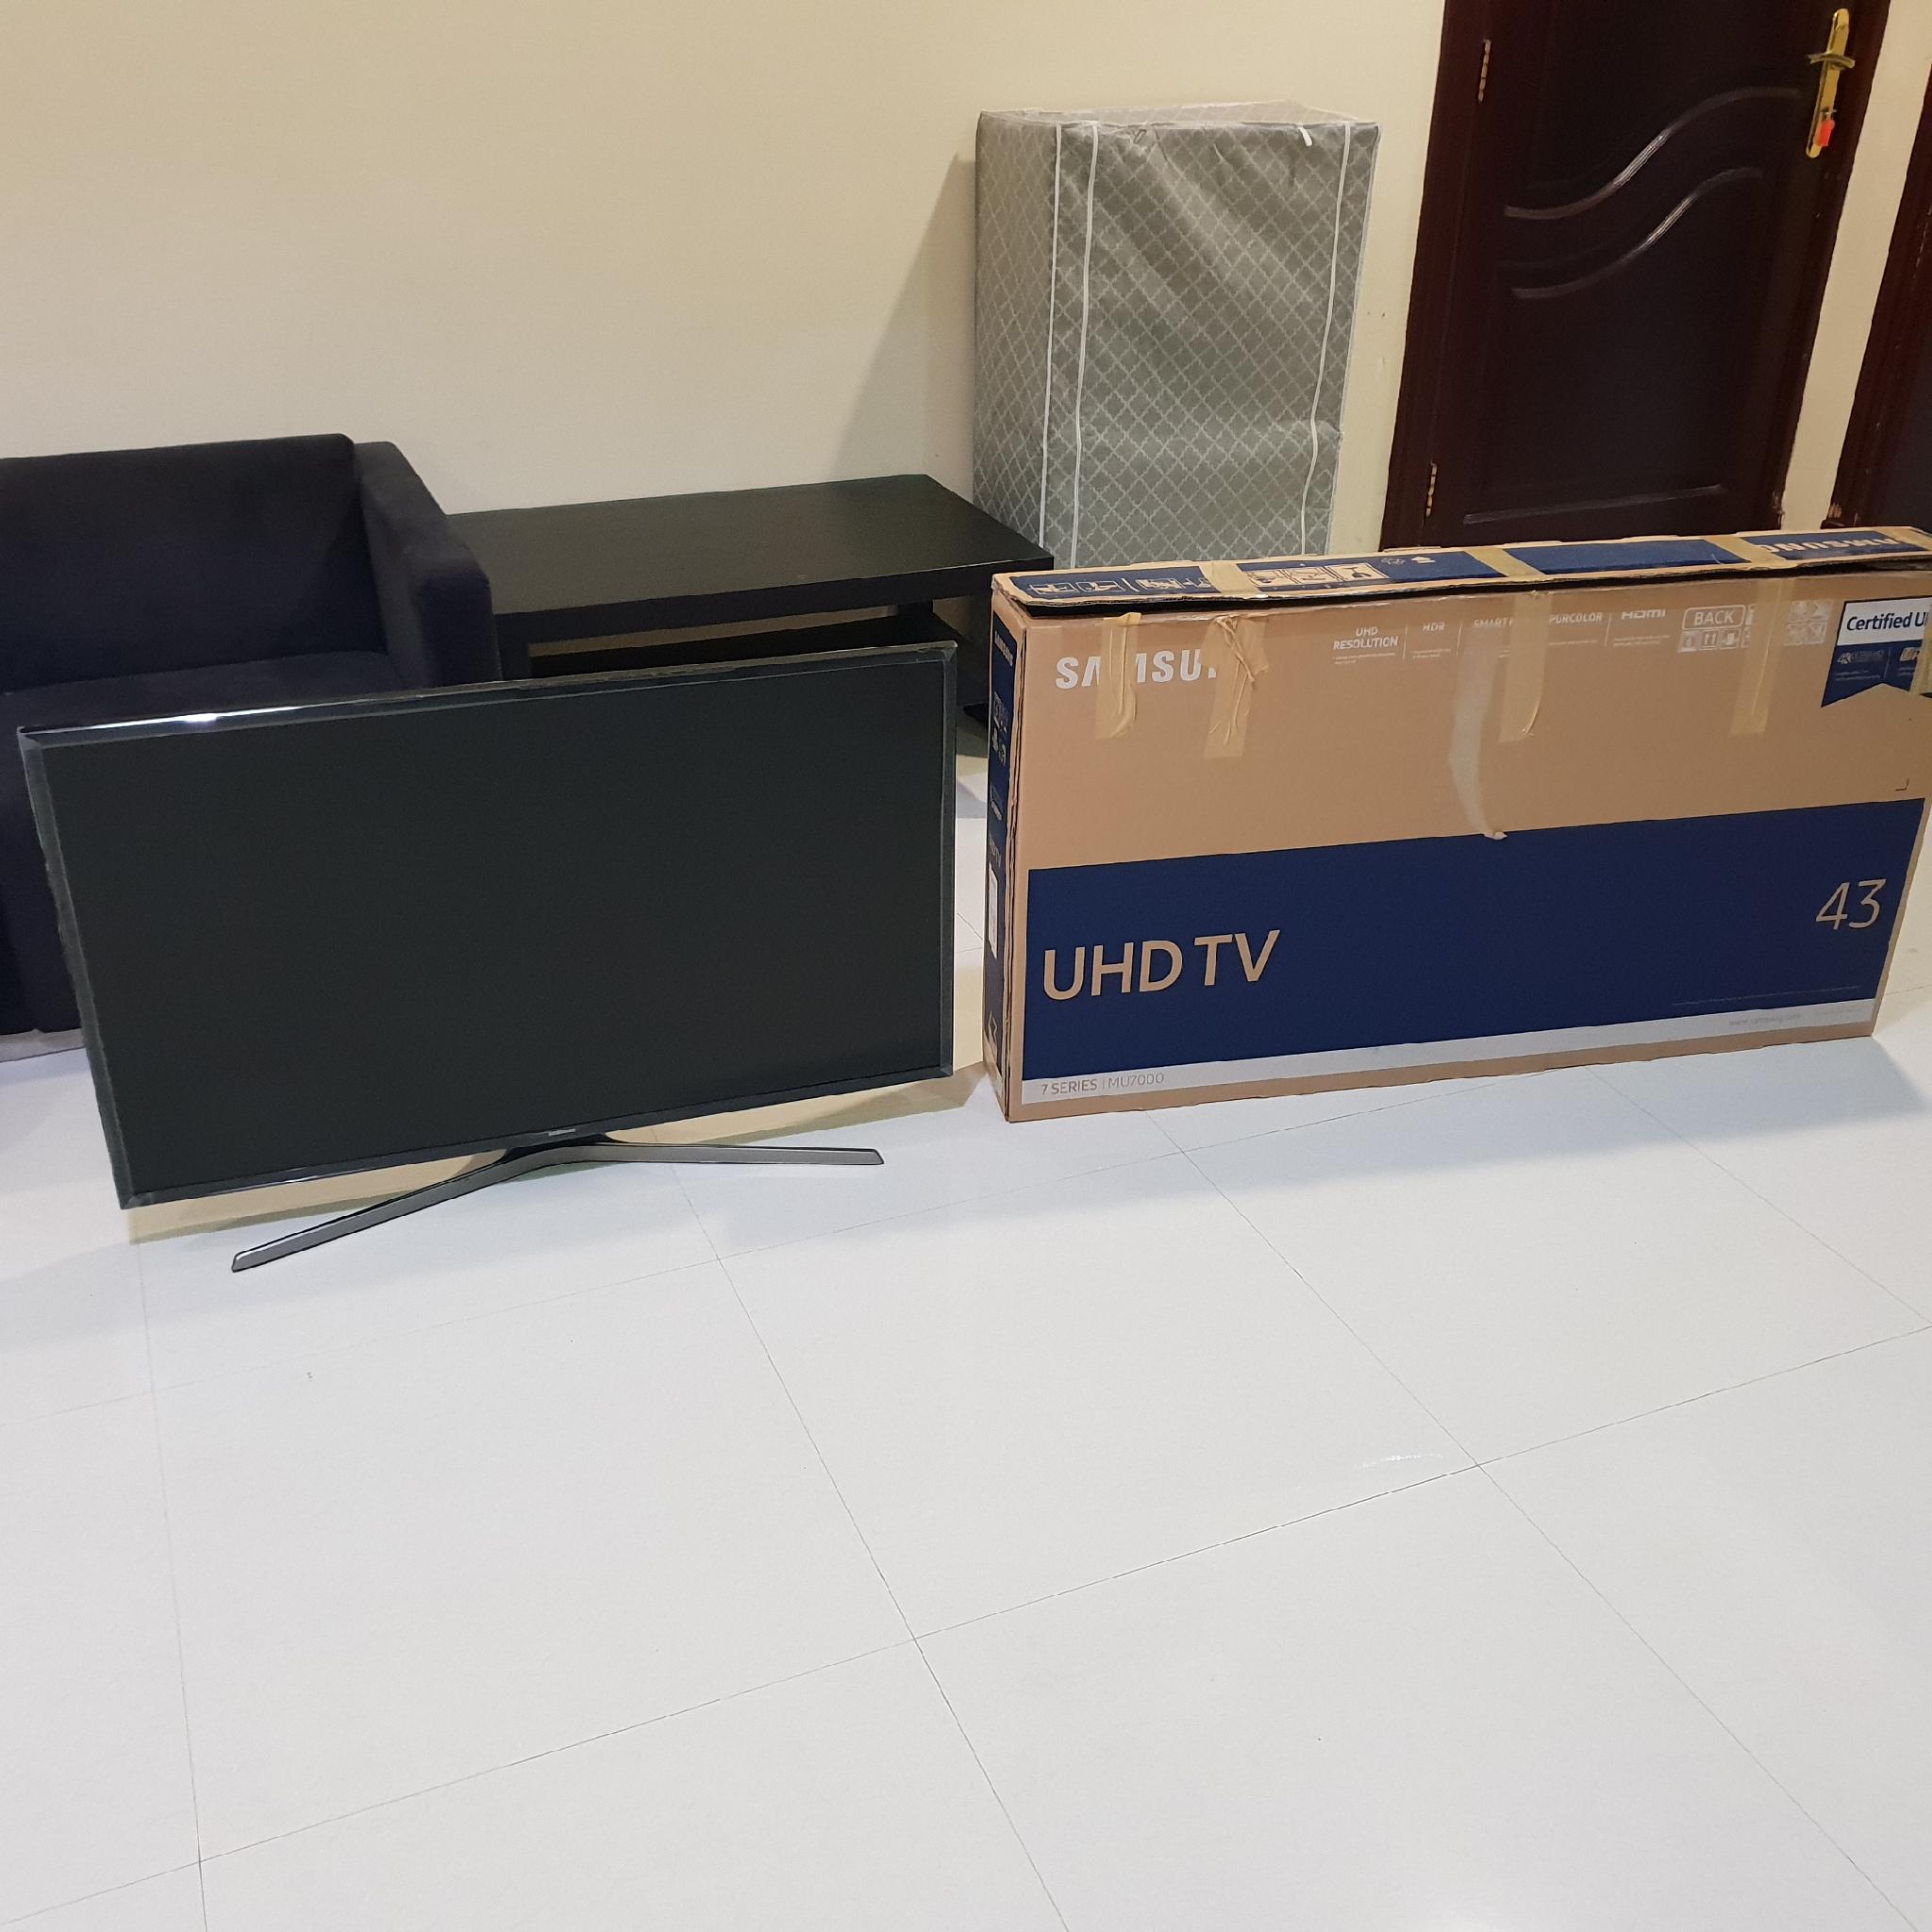 Samsung UHD TV 43 inches